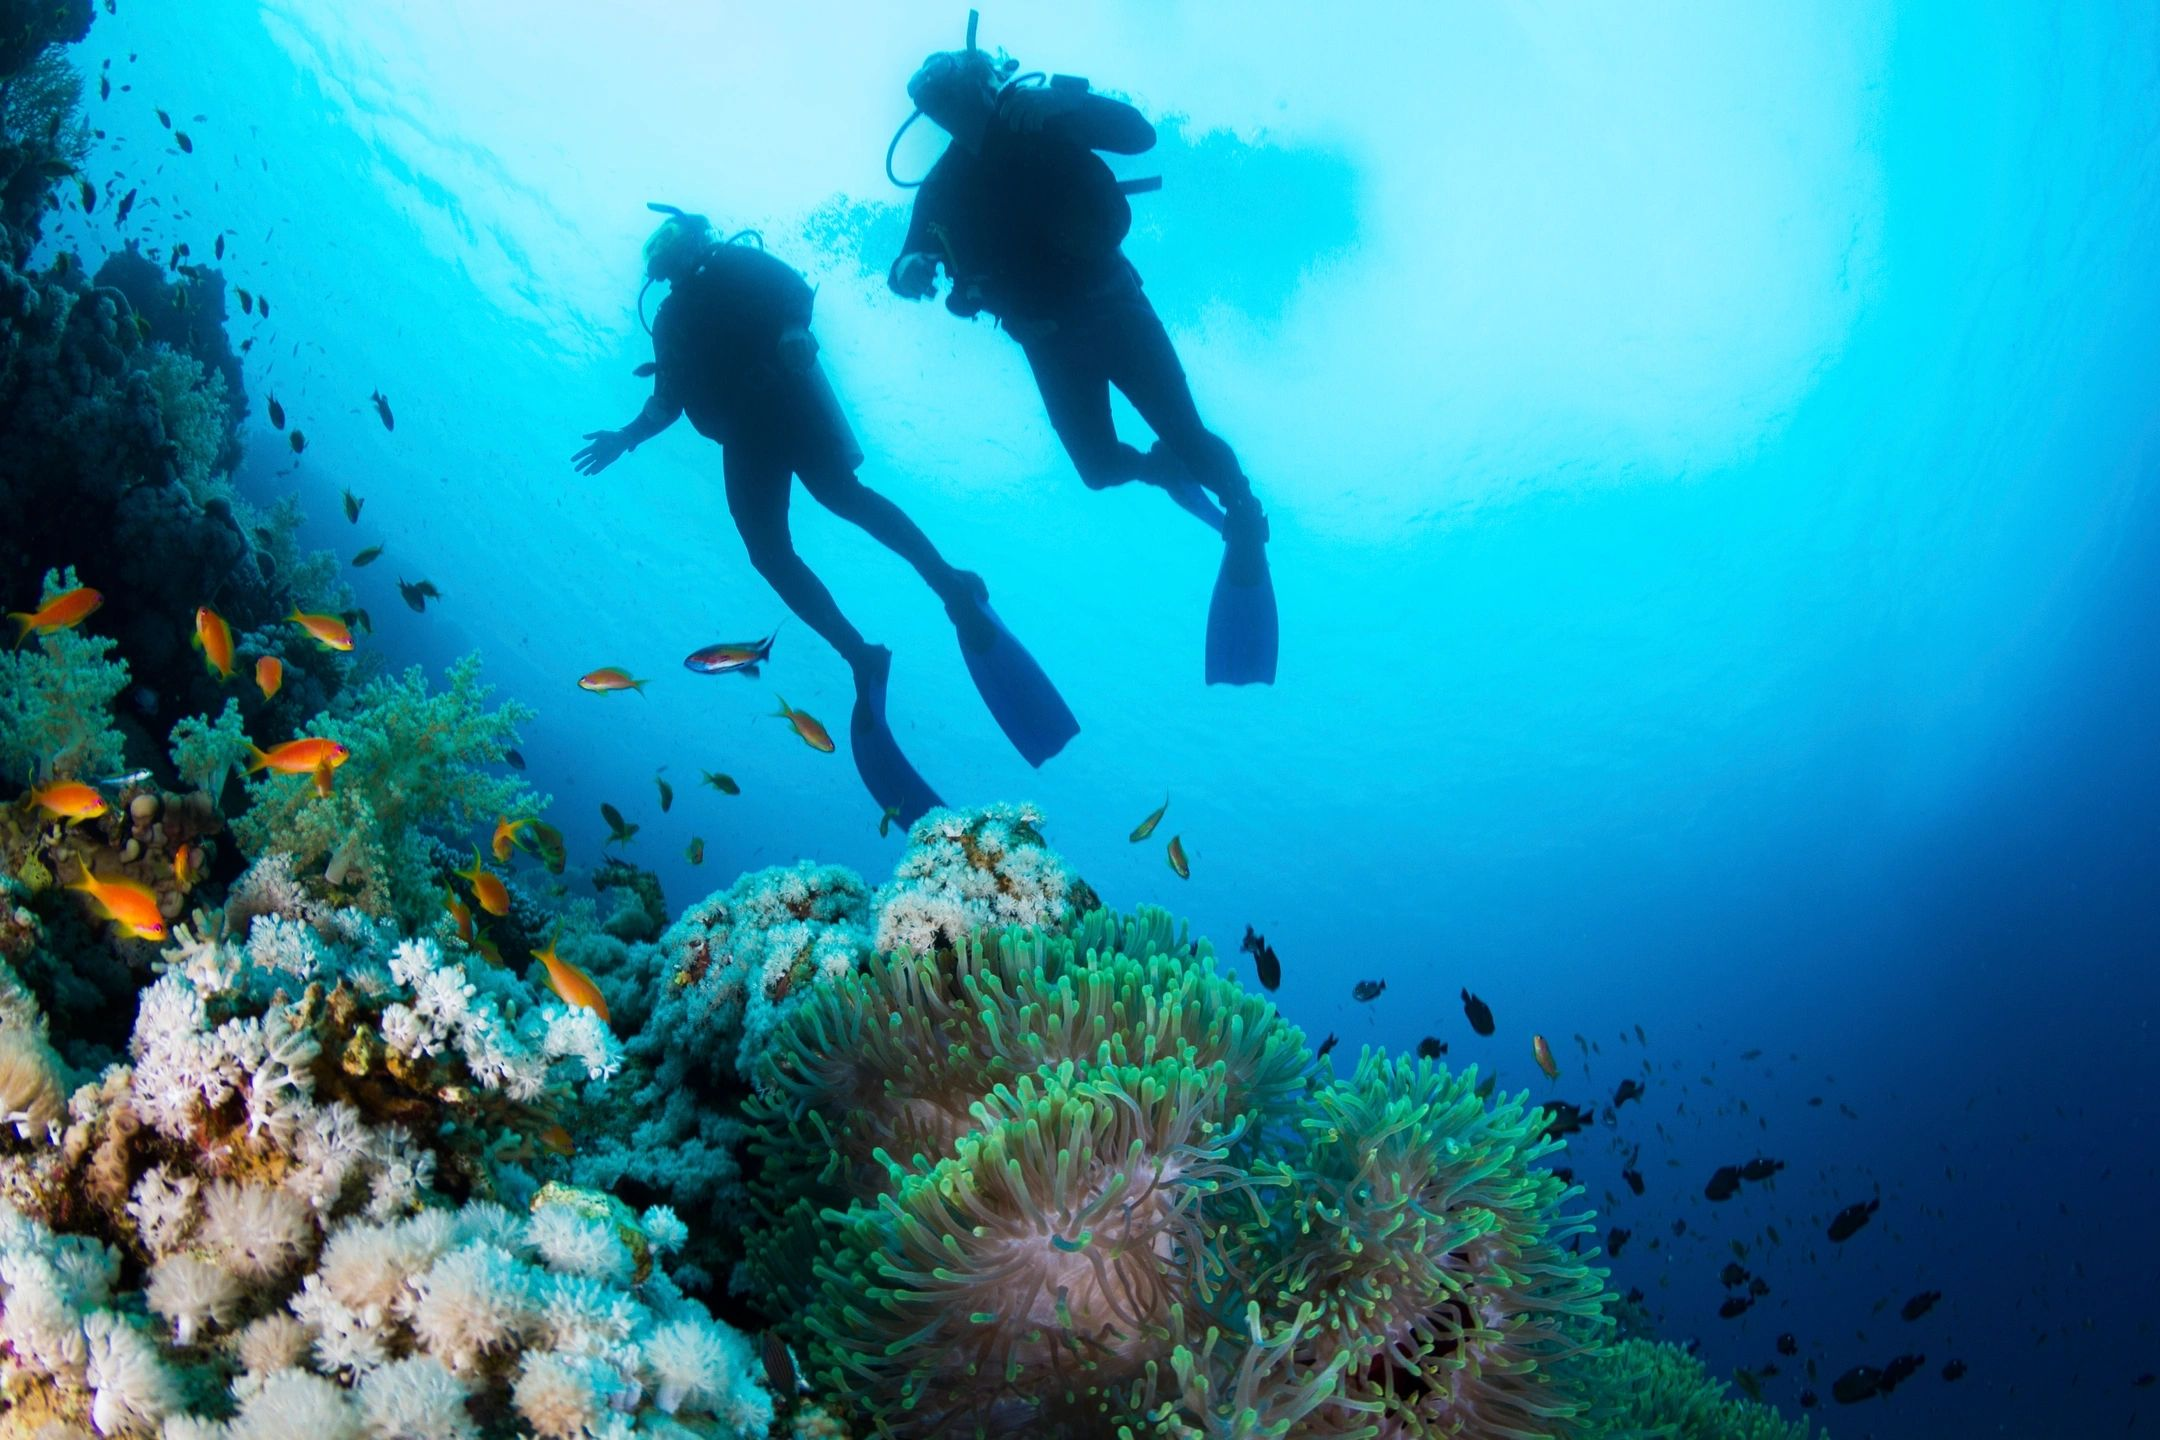 Australia's amazing underwater museum: the Great Barrier Reef